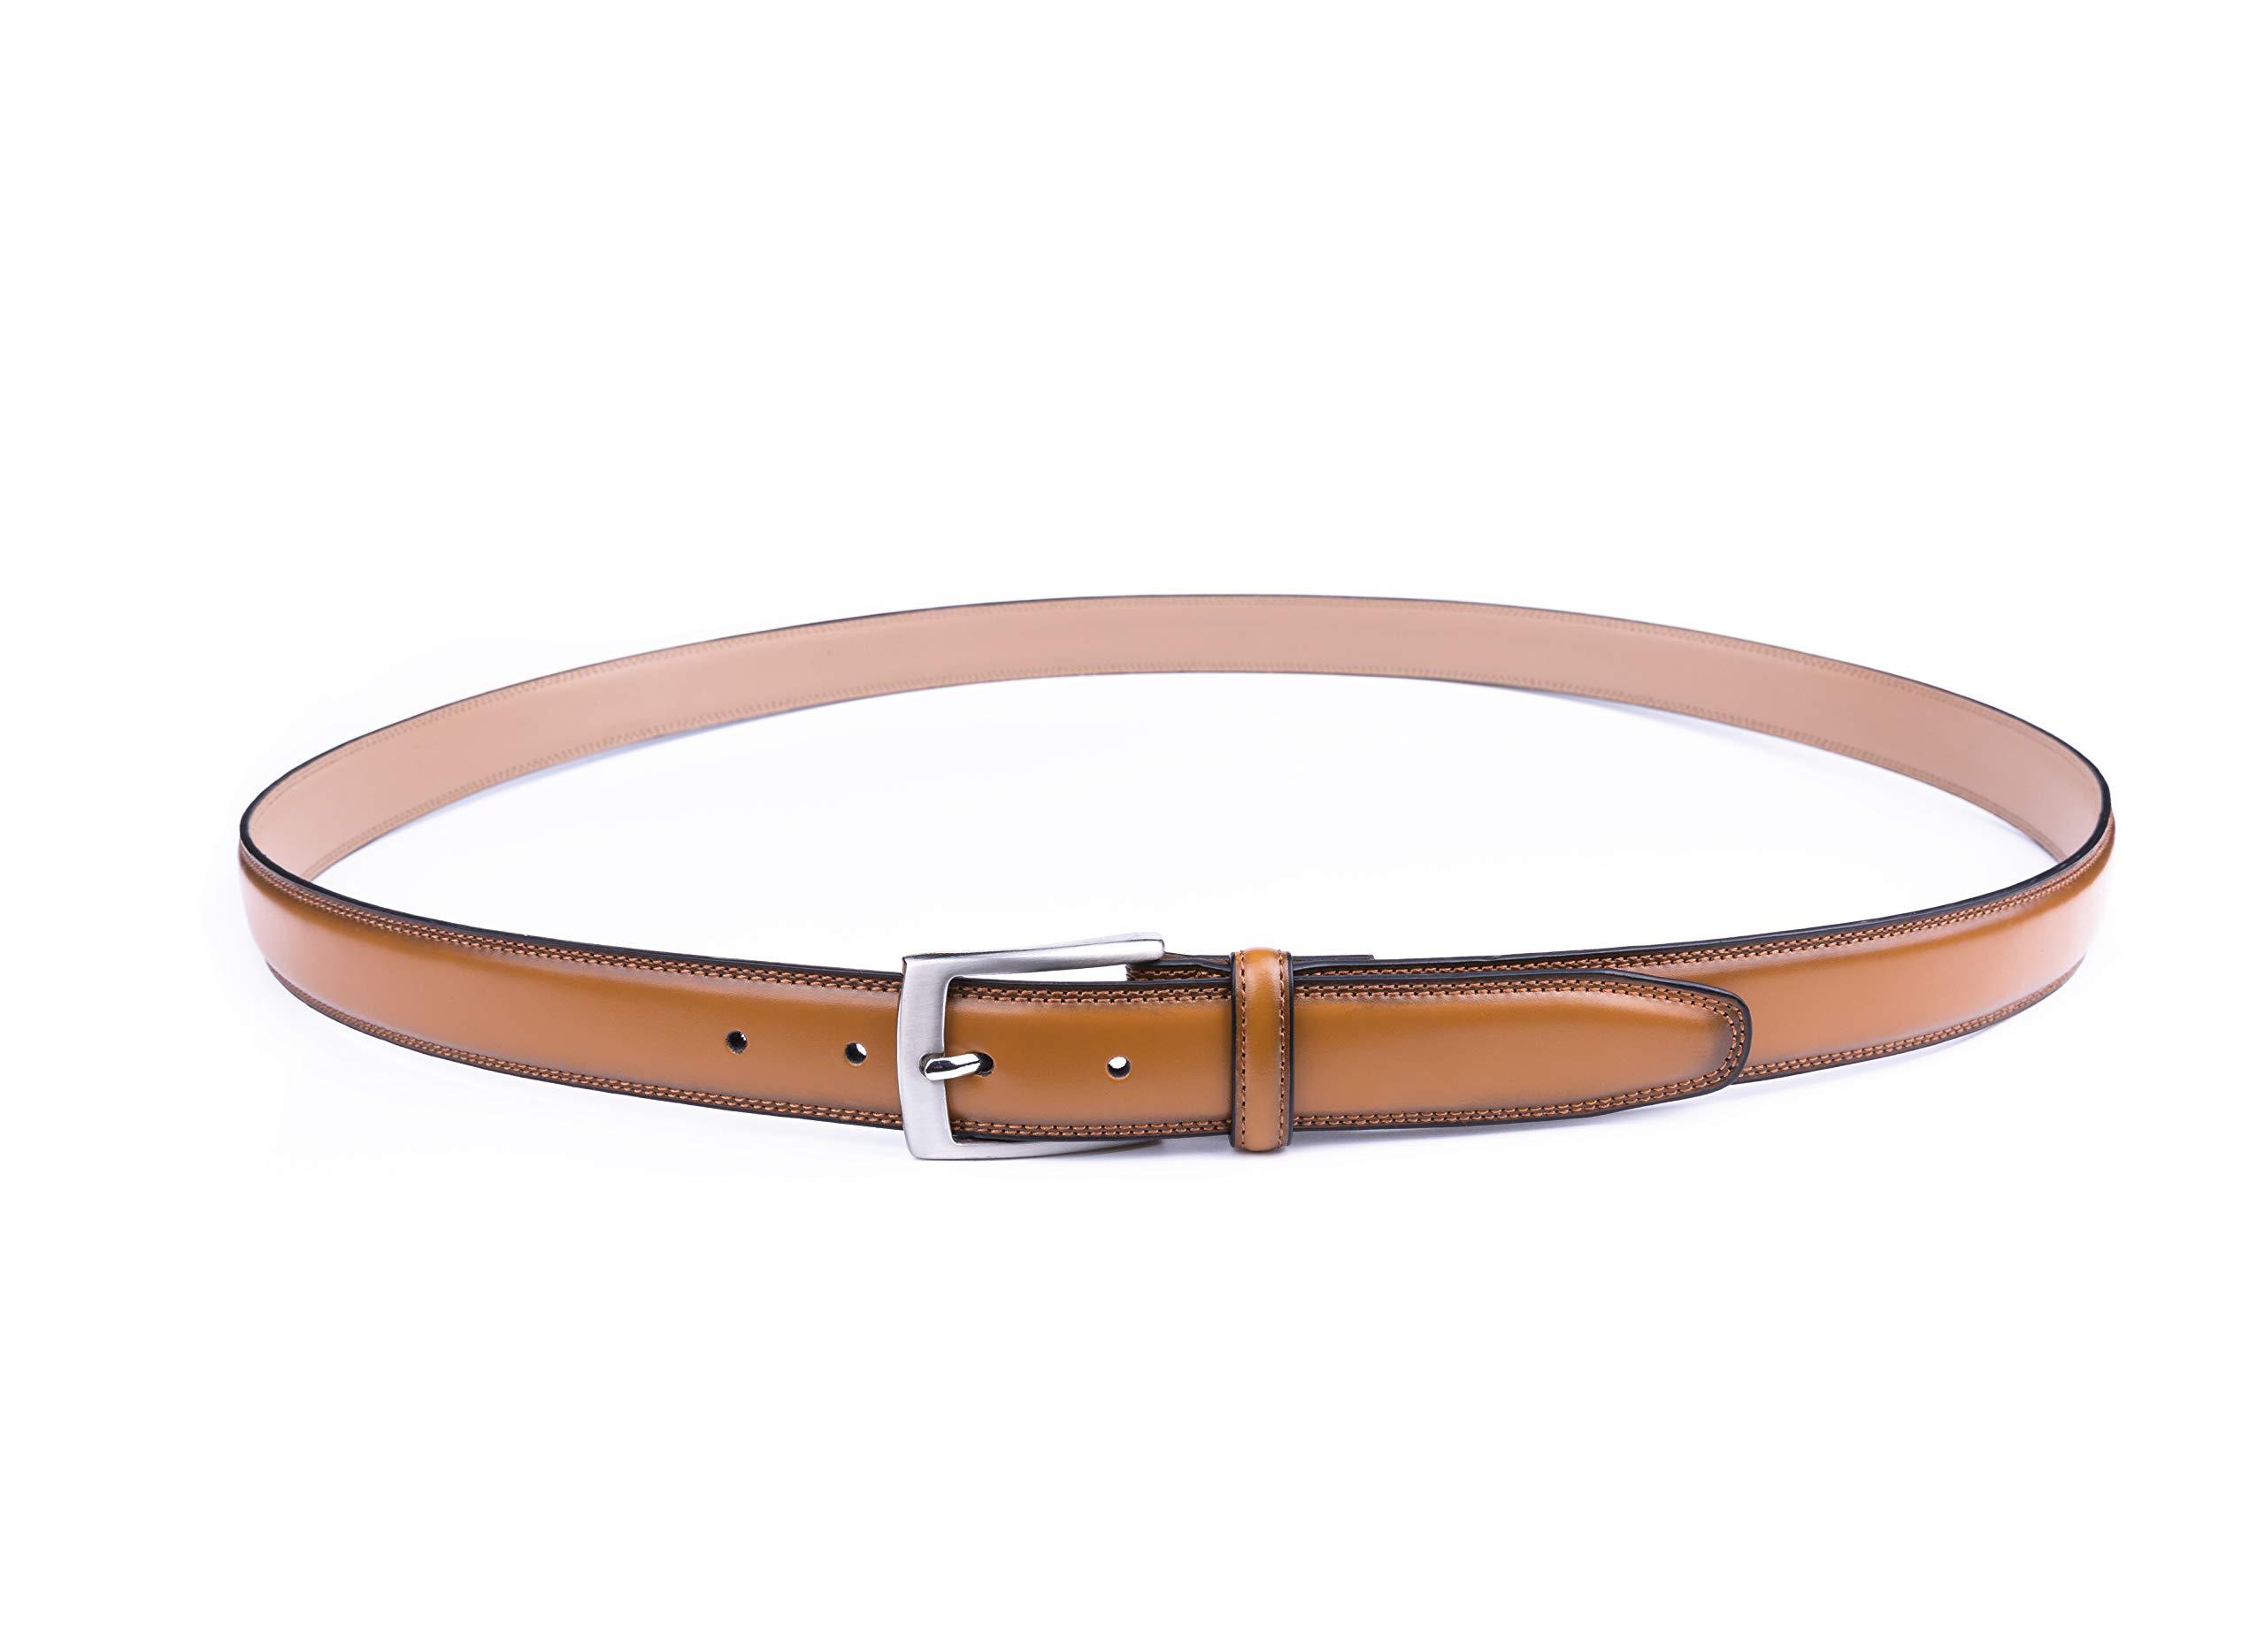 Milorde/'s Men Genuine Leather Belt Single Prong Buckle Fashion Classic Design